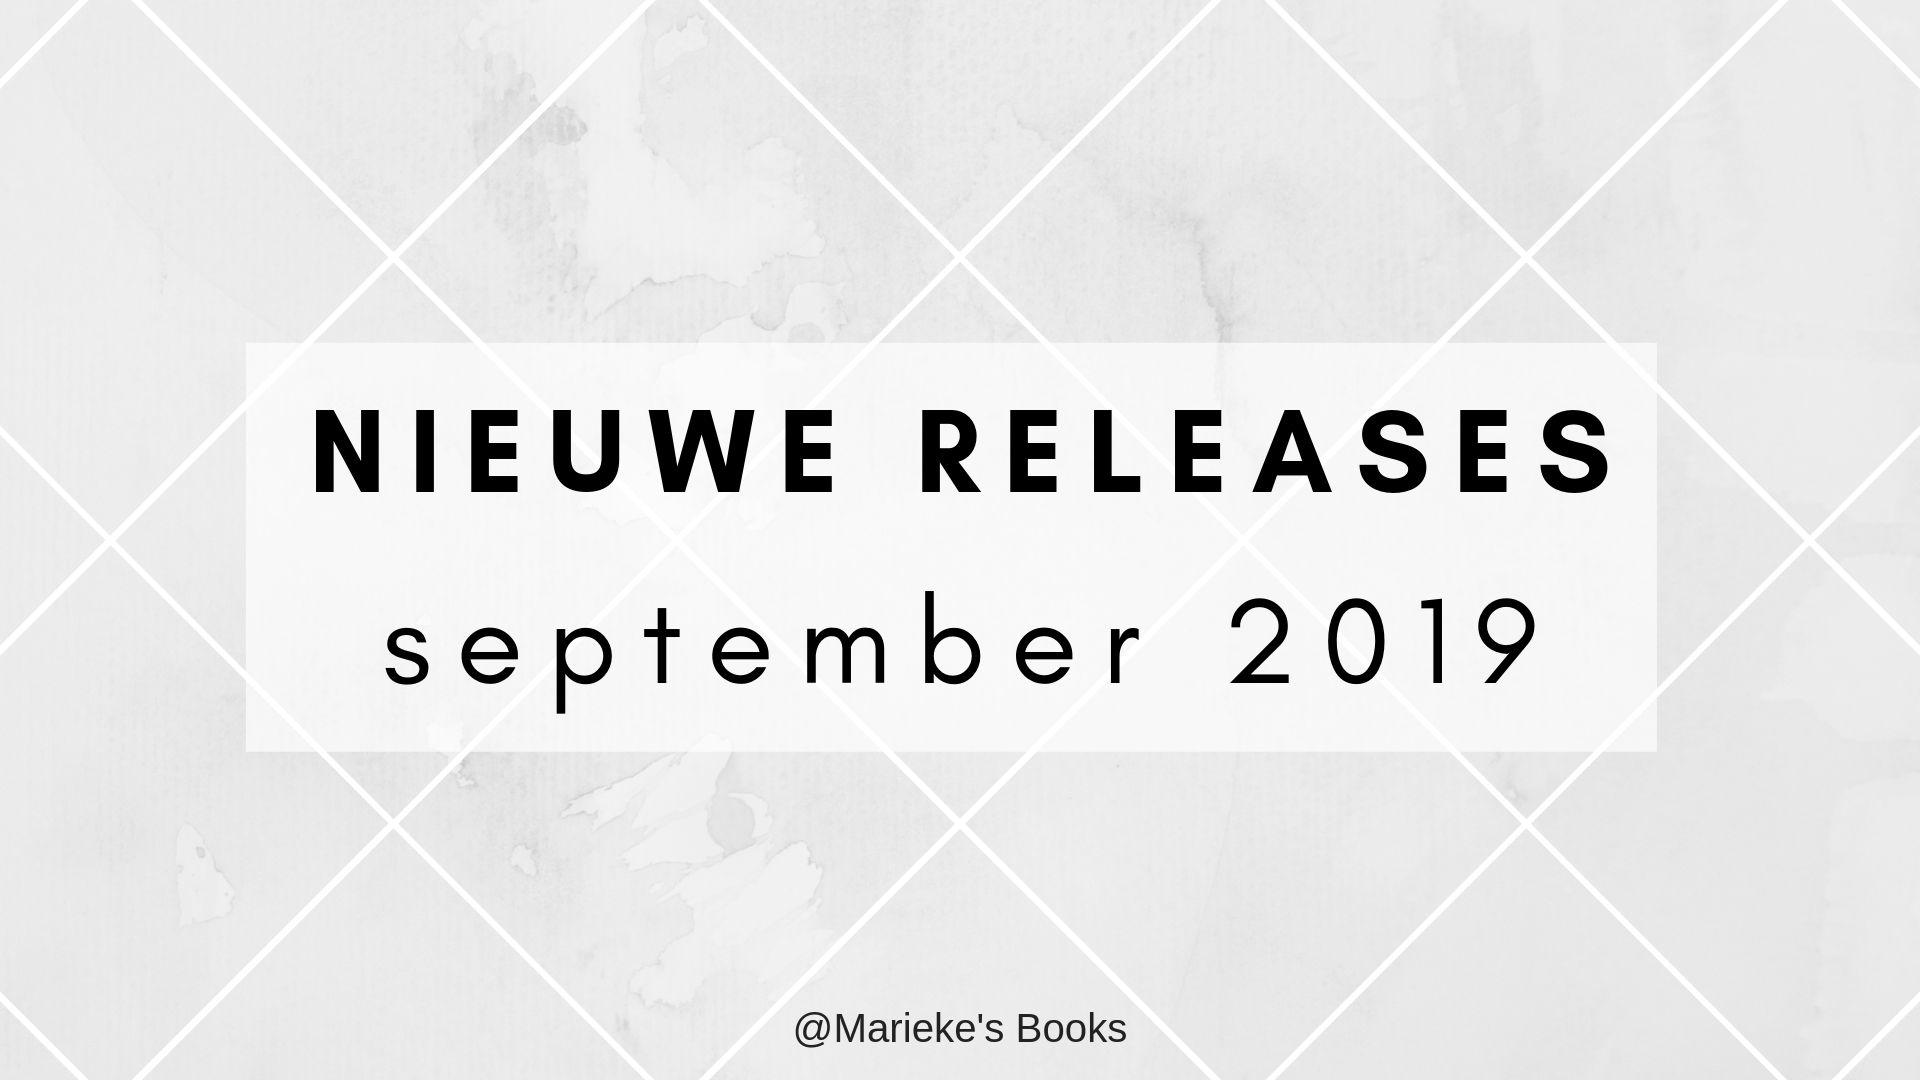 Nieuwe releases september 2019 | Marieke's Books